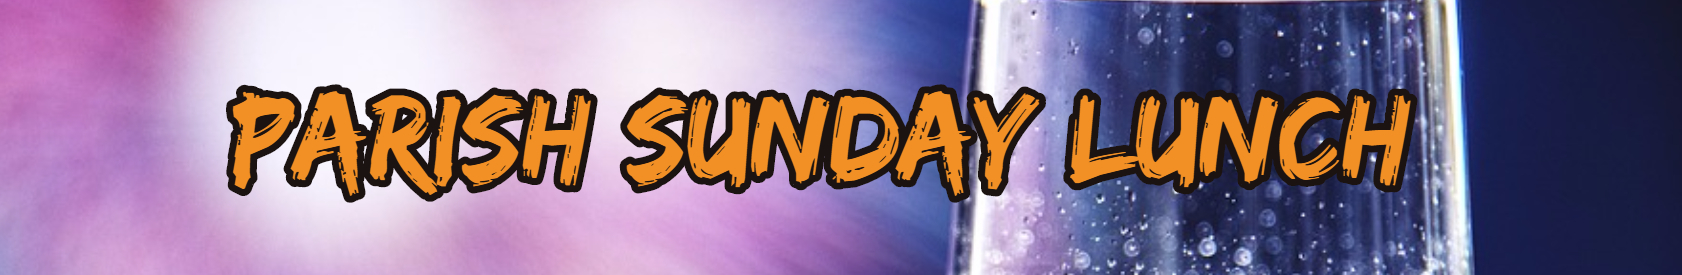 Parish Sunday Lunch – 26 April 2020